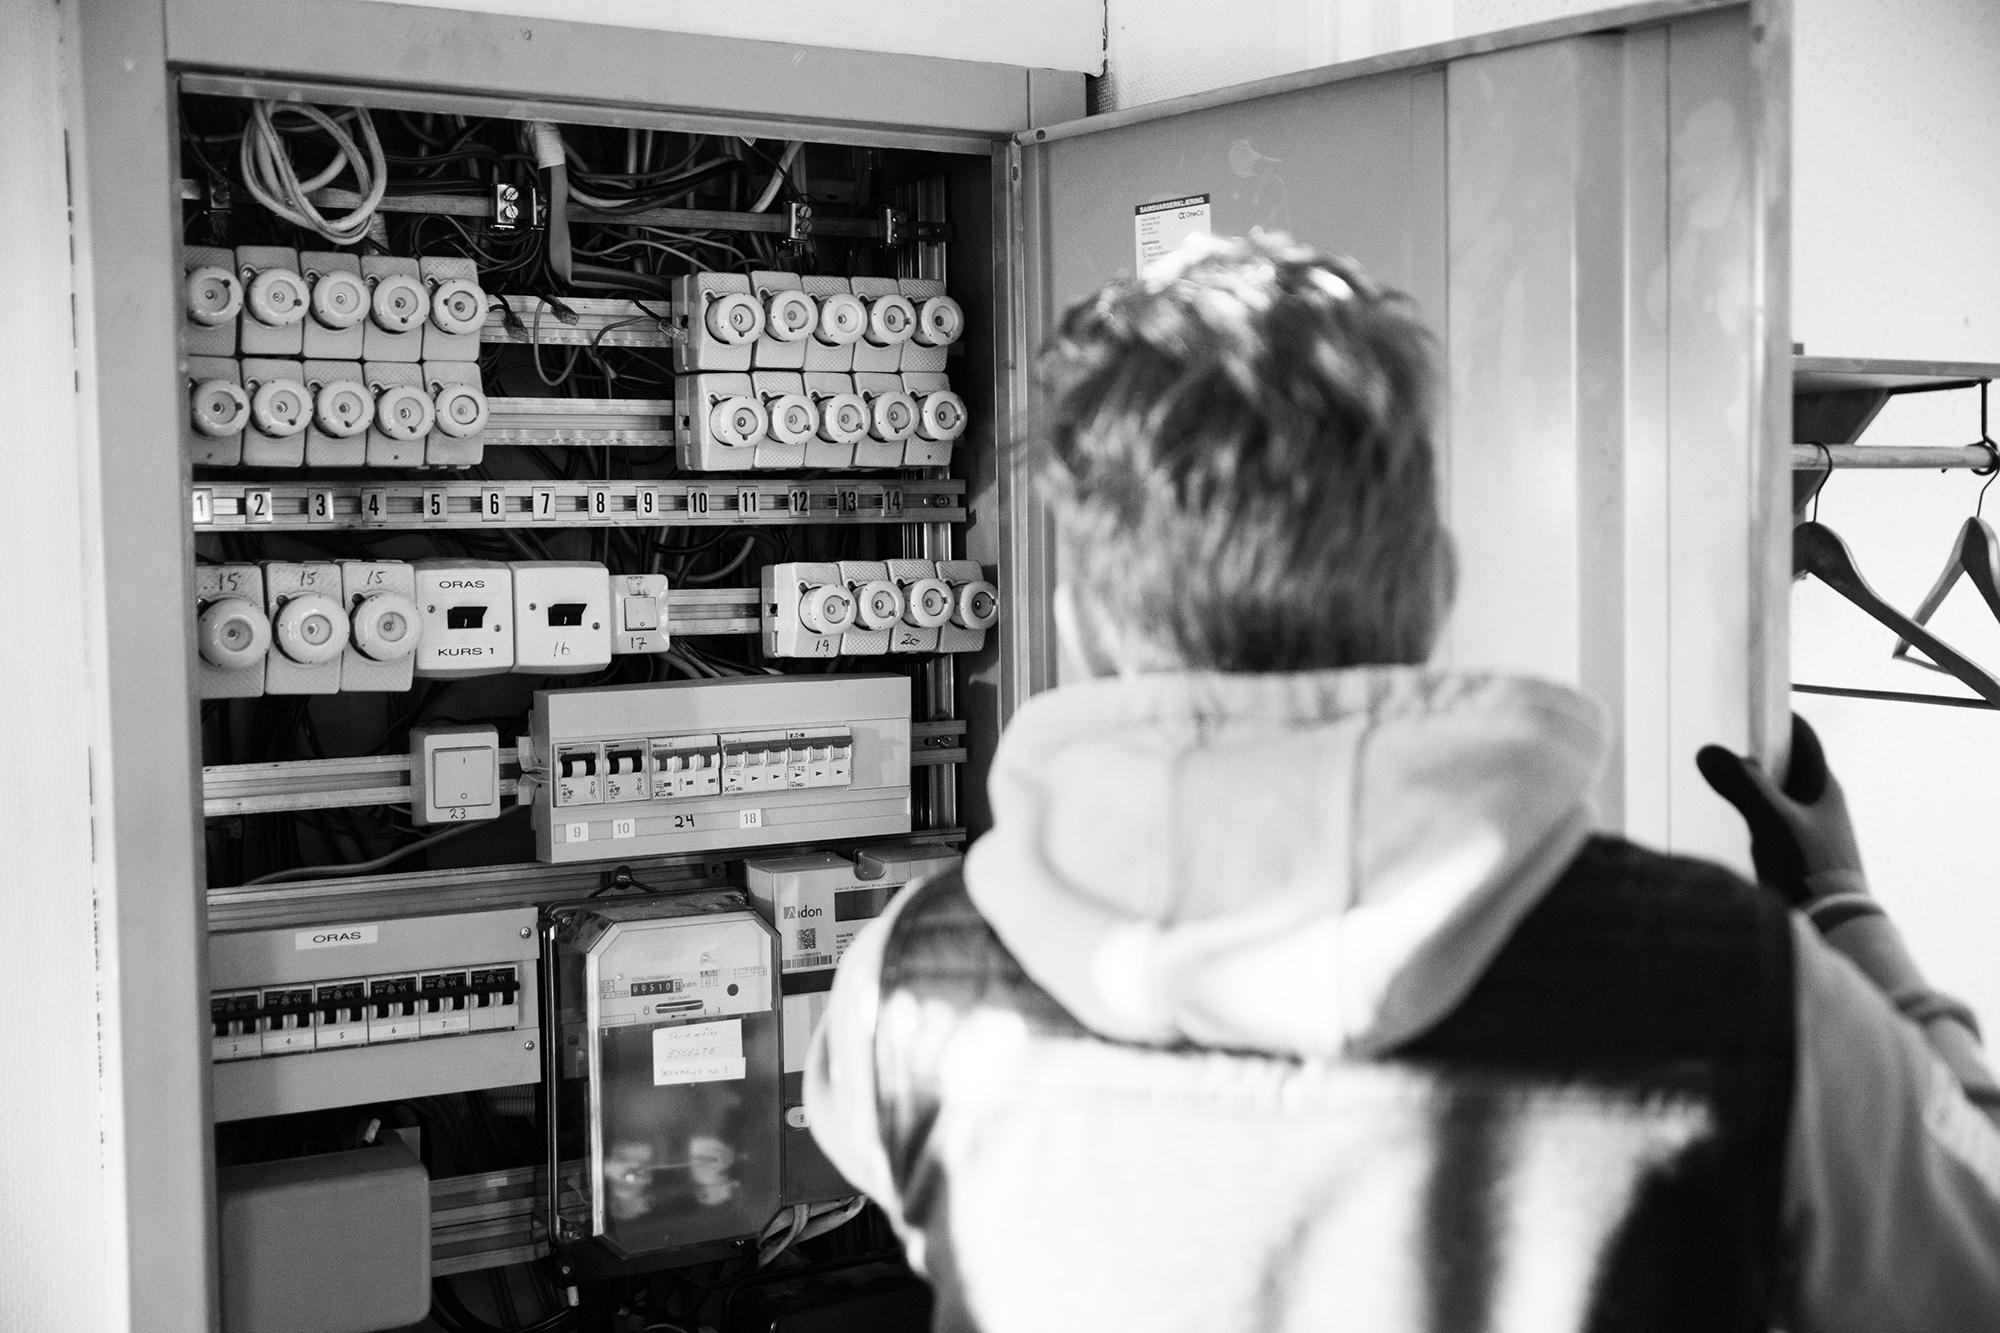 Stoltelektro_Elektriker i sikringsboks_Foto